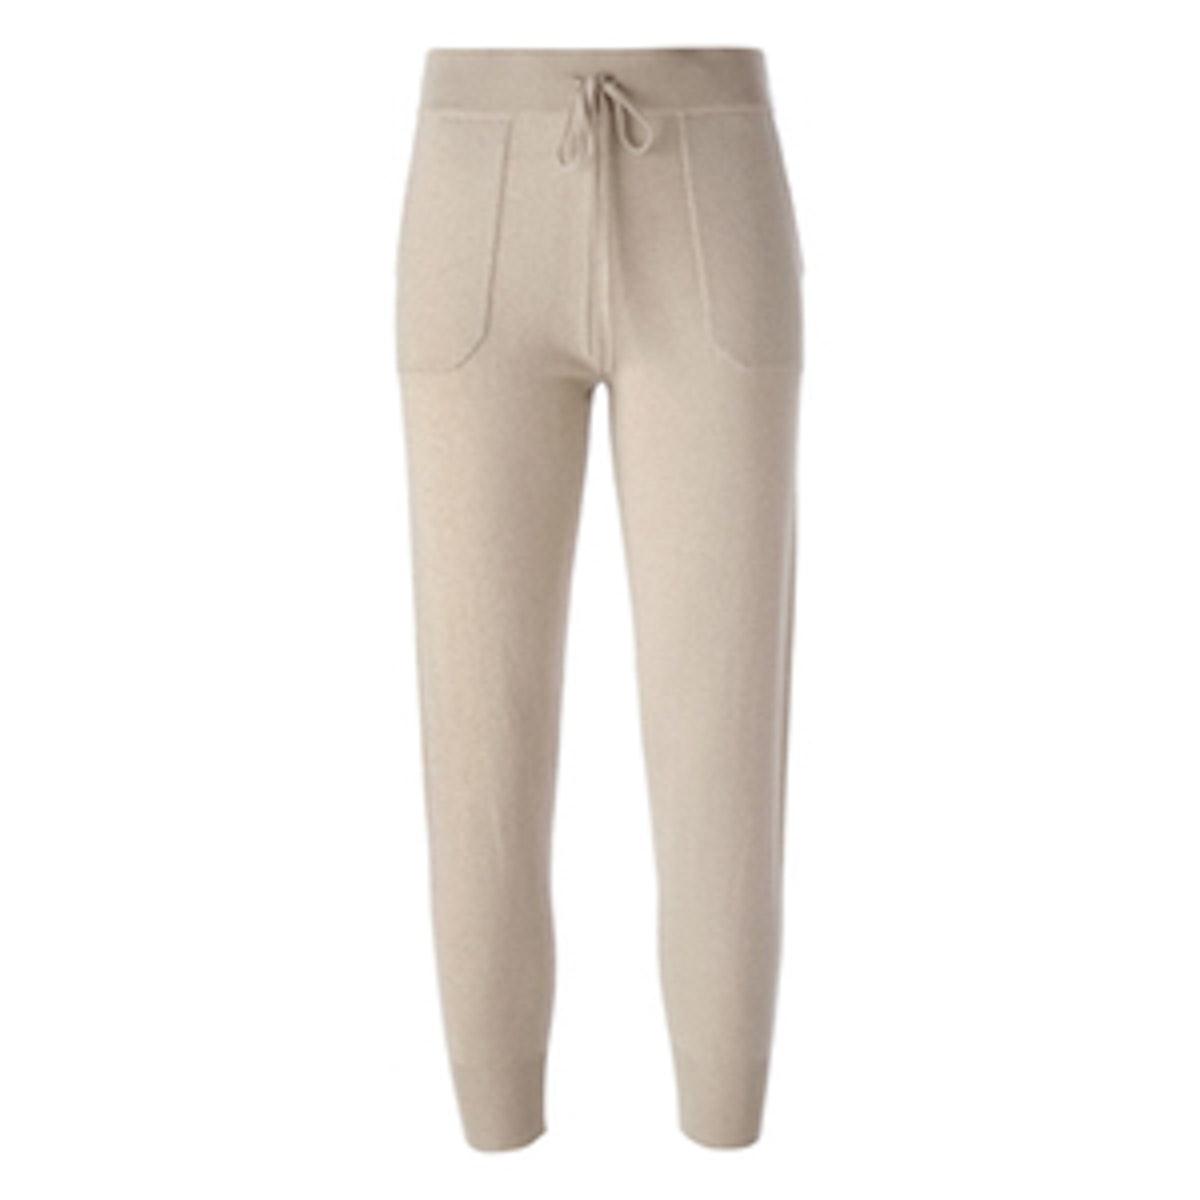 Arleena Knitted Track Pants